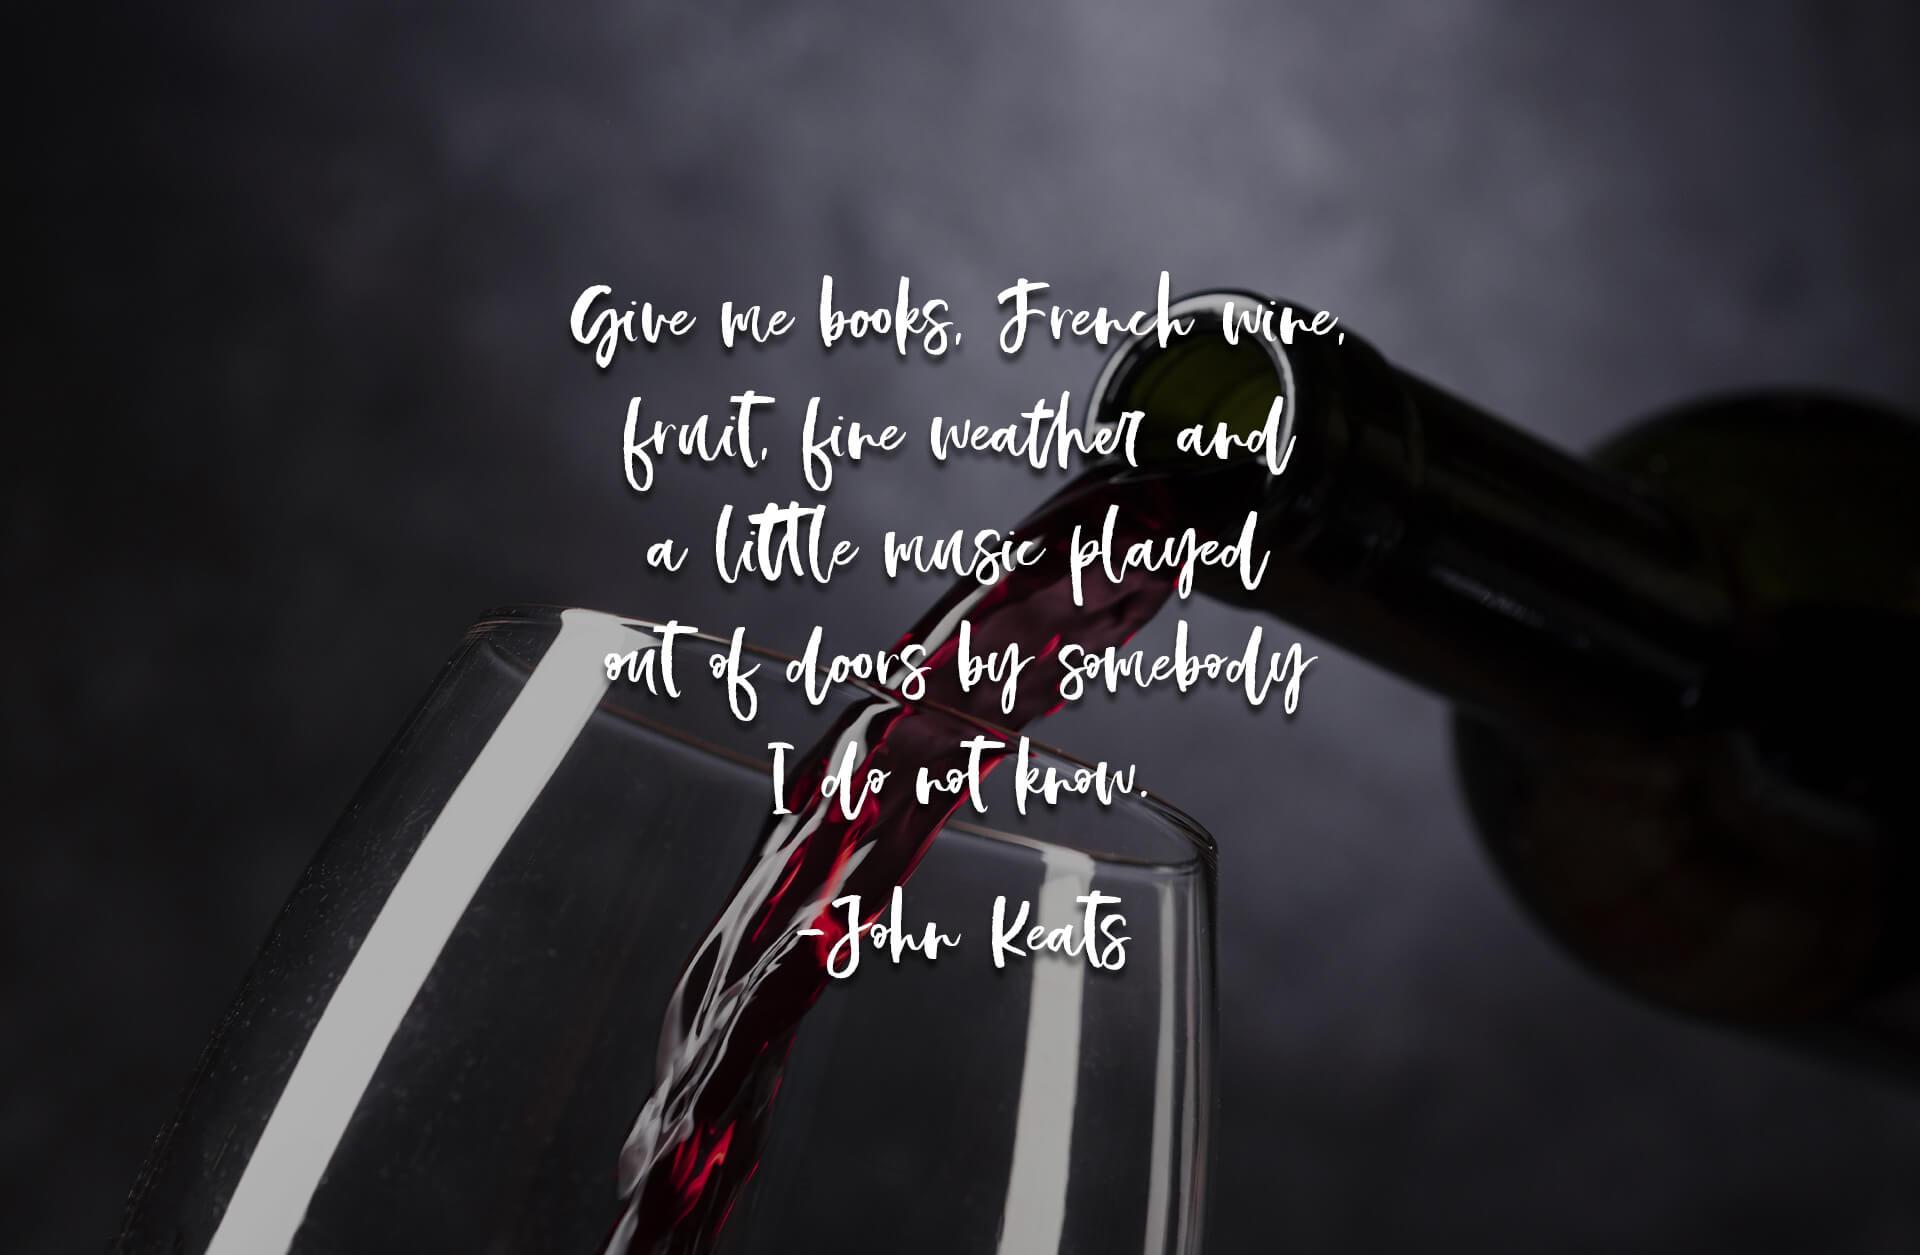 #100DaysOfWildWineDesign Wine Label Design-John Keats Quote